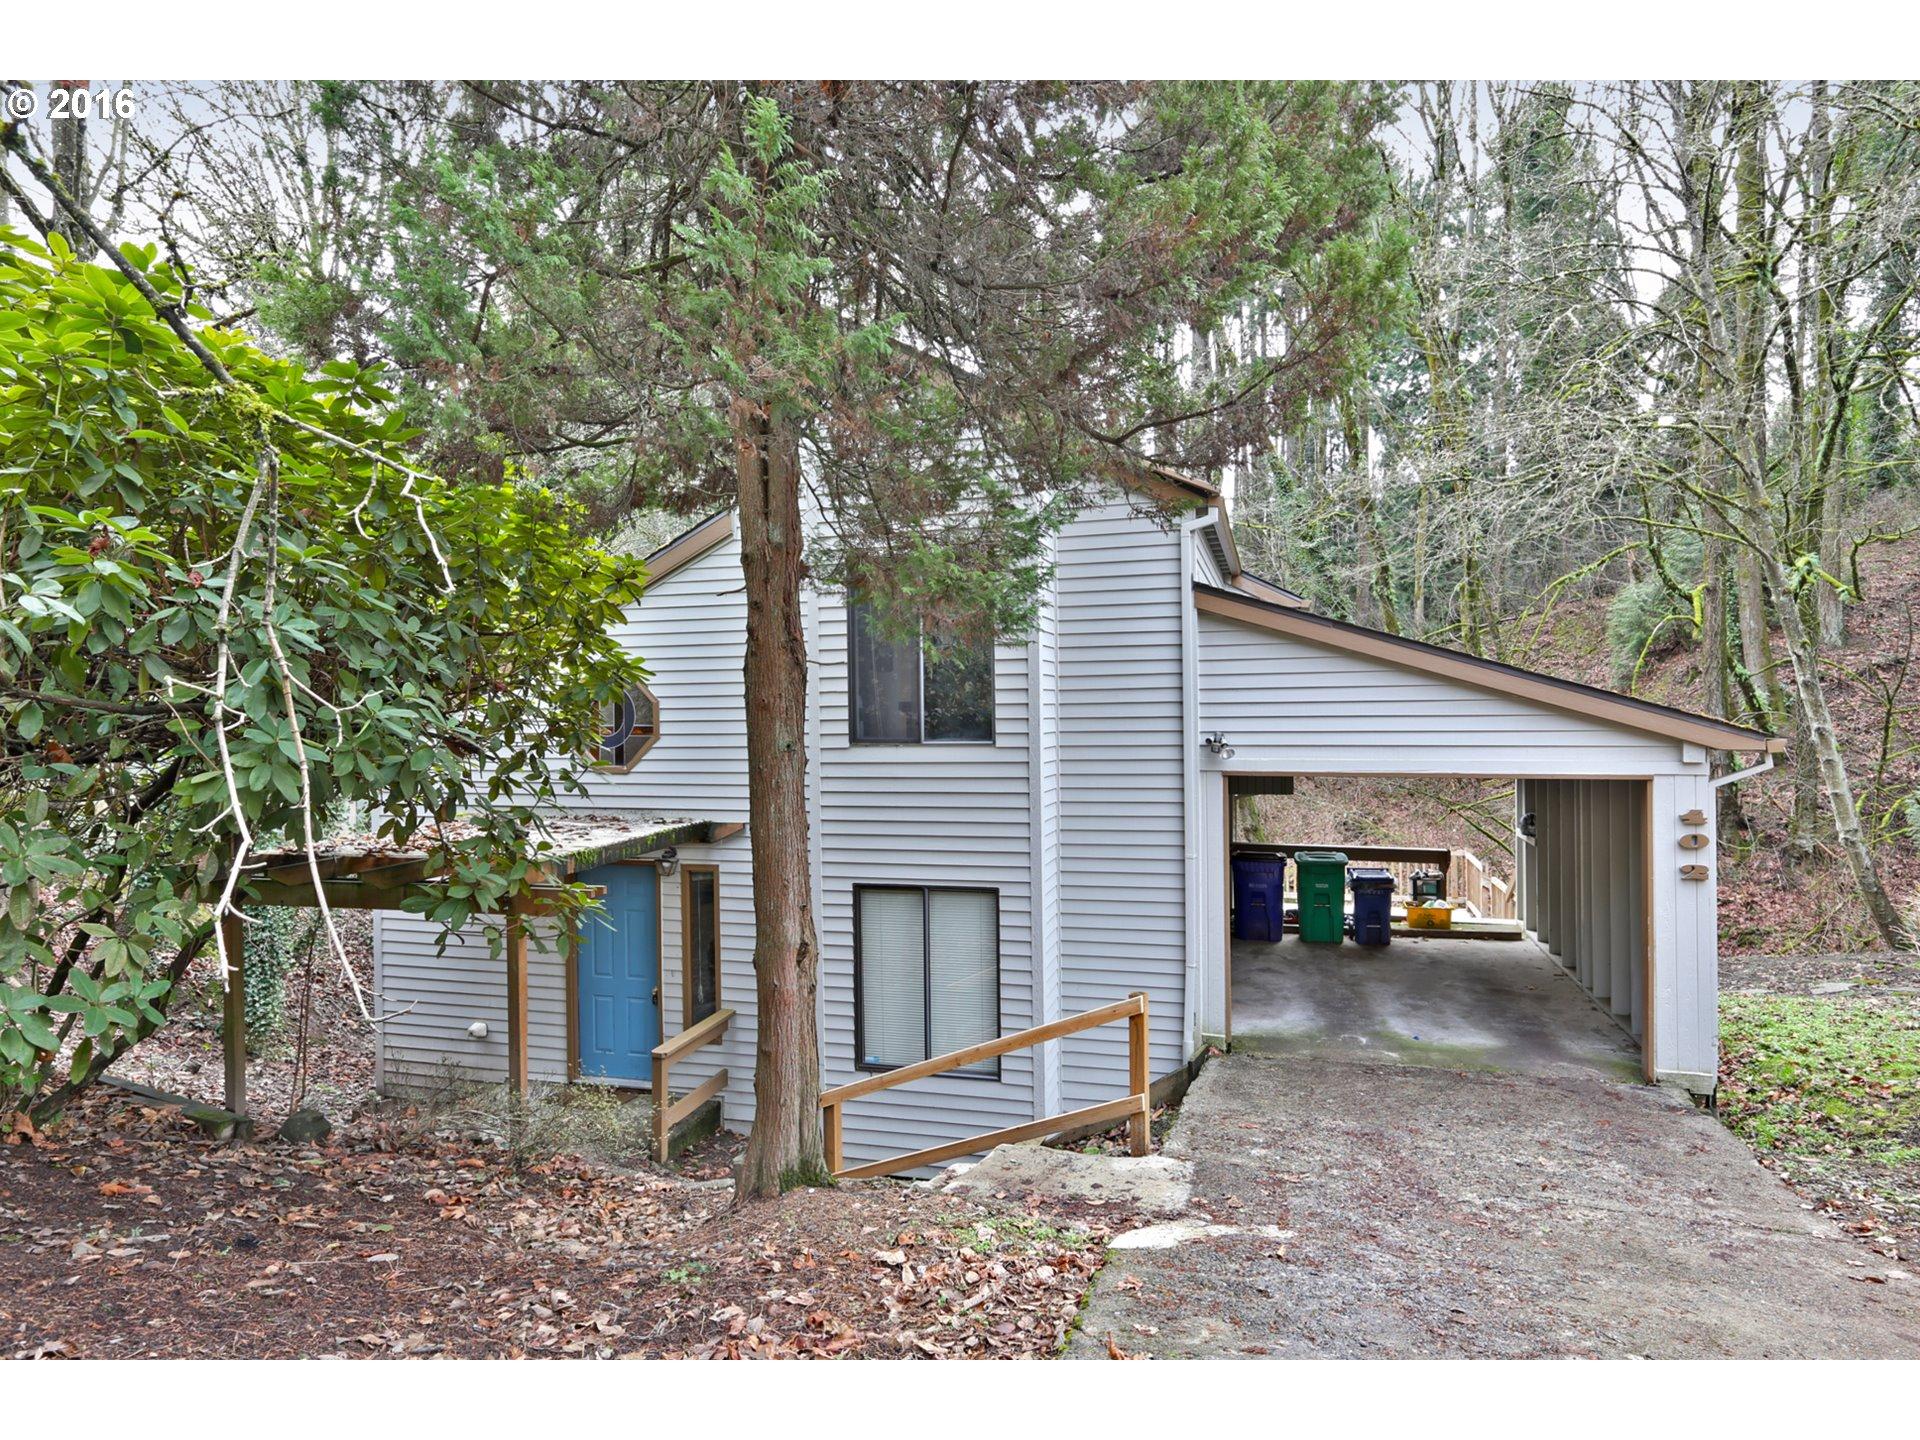 $350,000 - 3Br/2Ba -  for Sale in Fulton Park, Portland